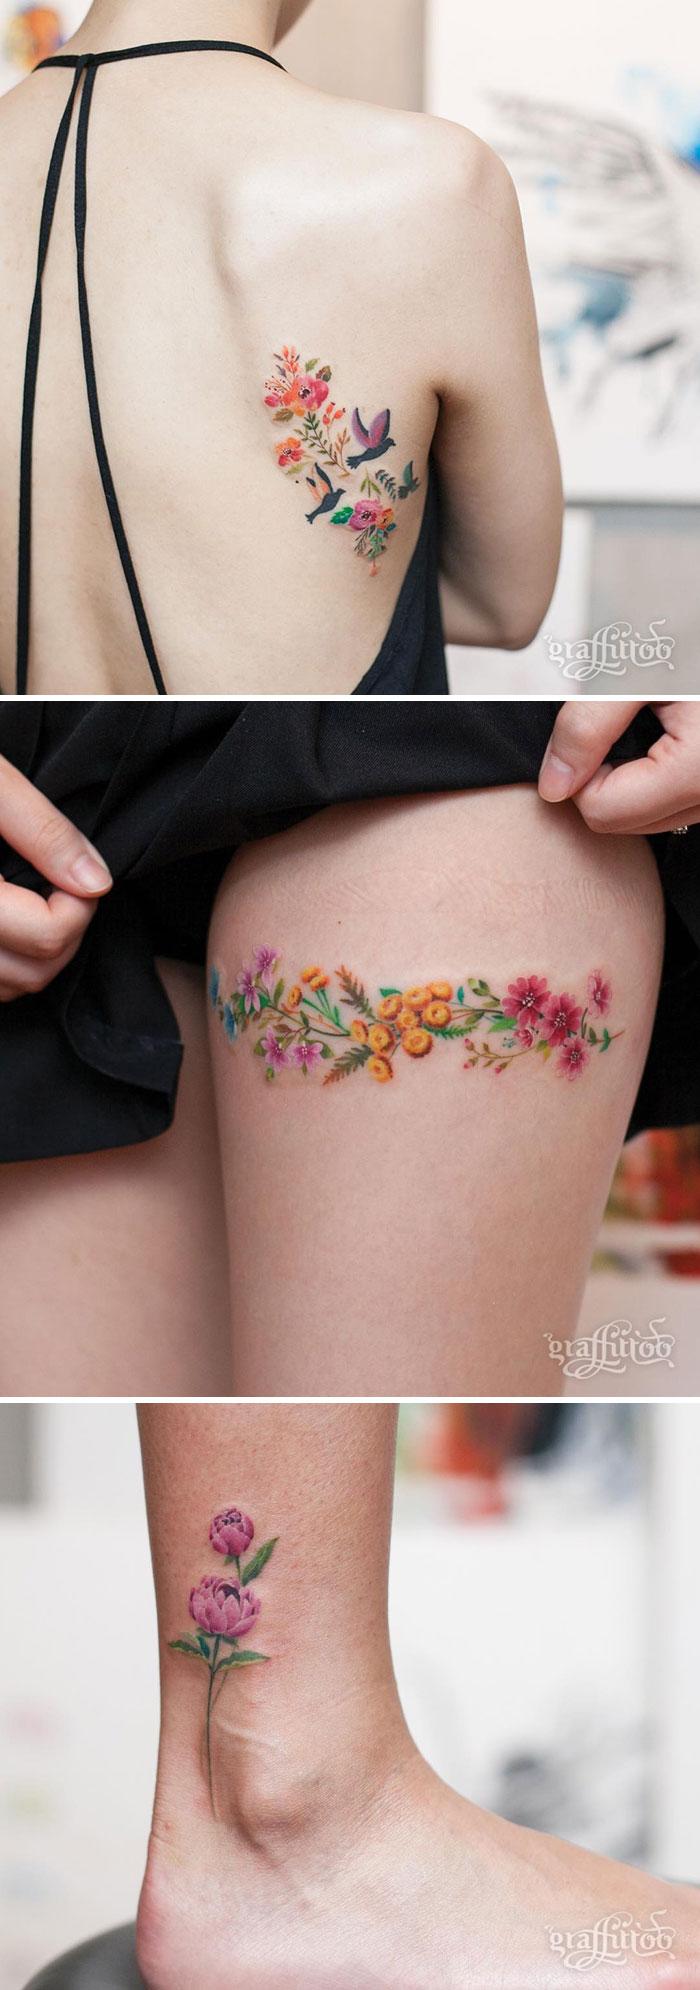 floral-tattoo-artists-21-58e25ec3bd303__700